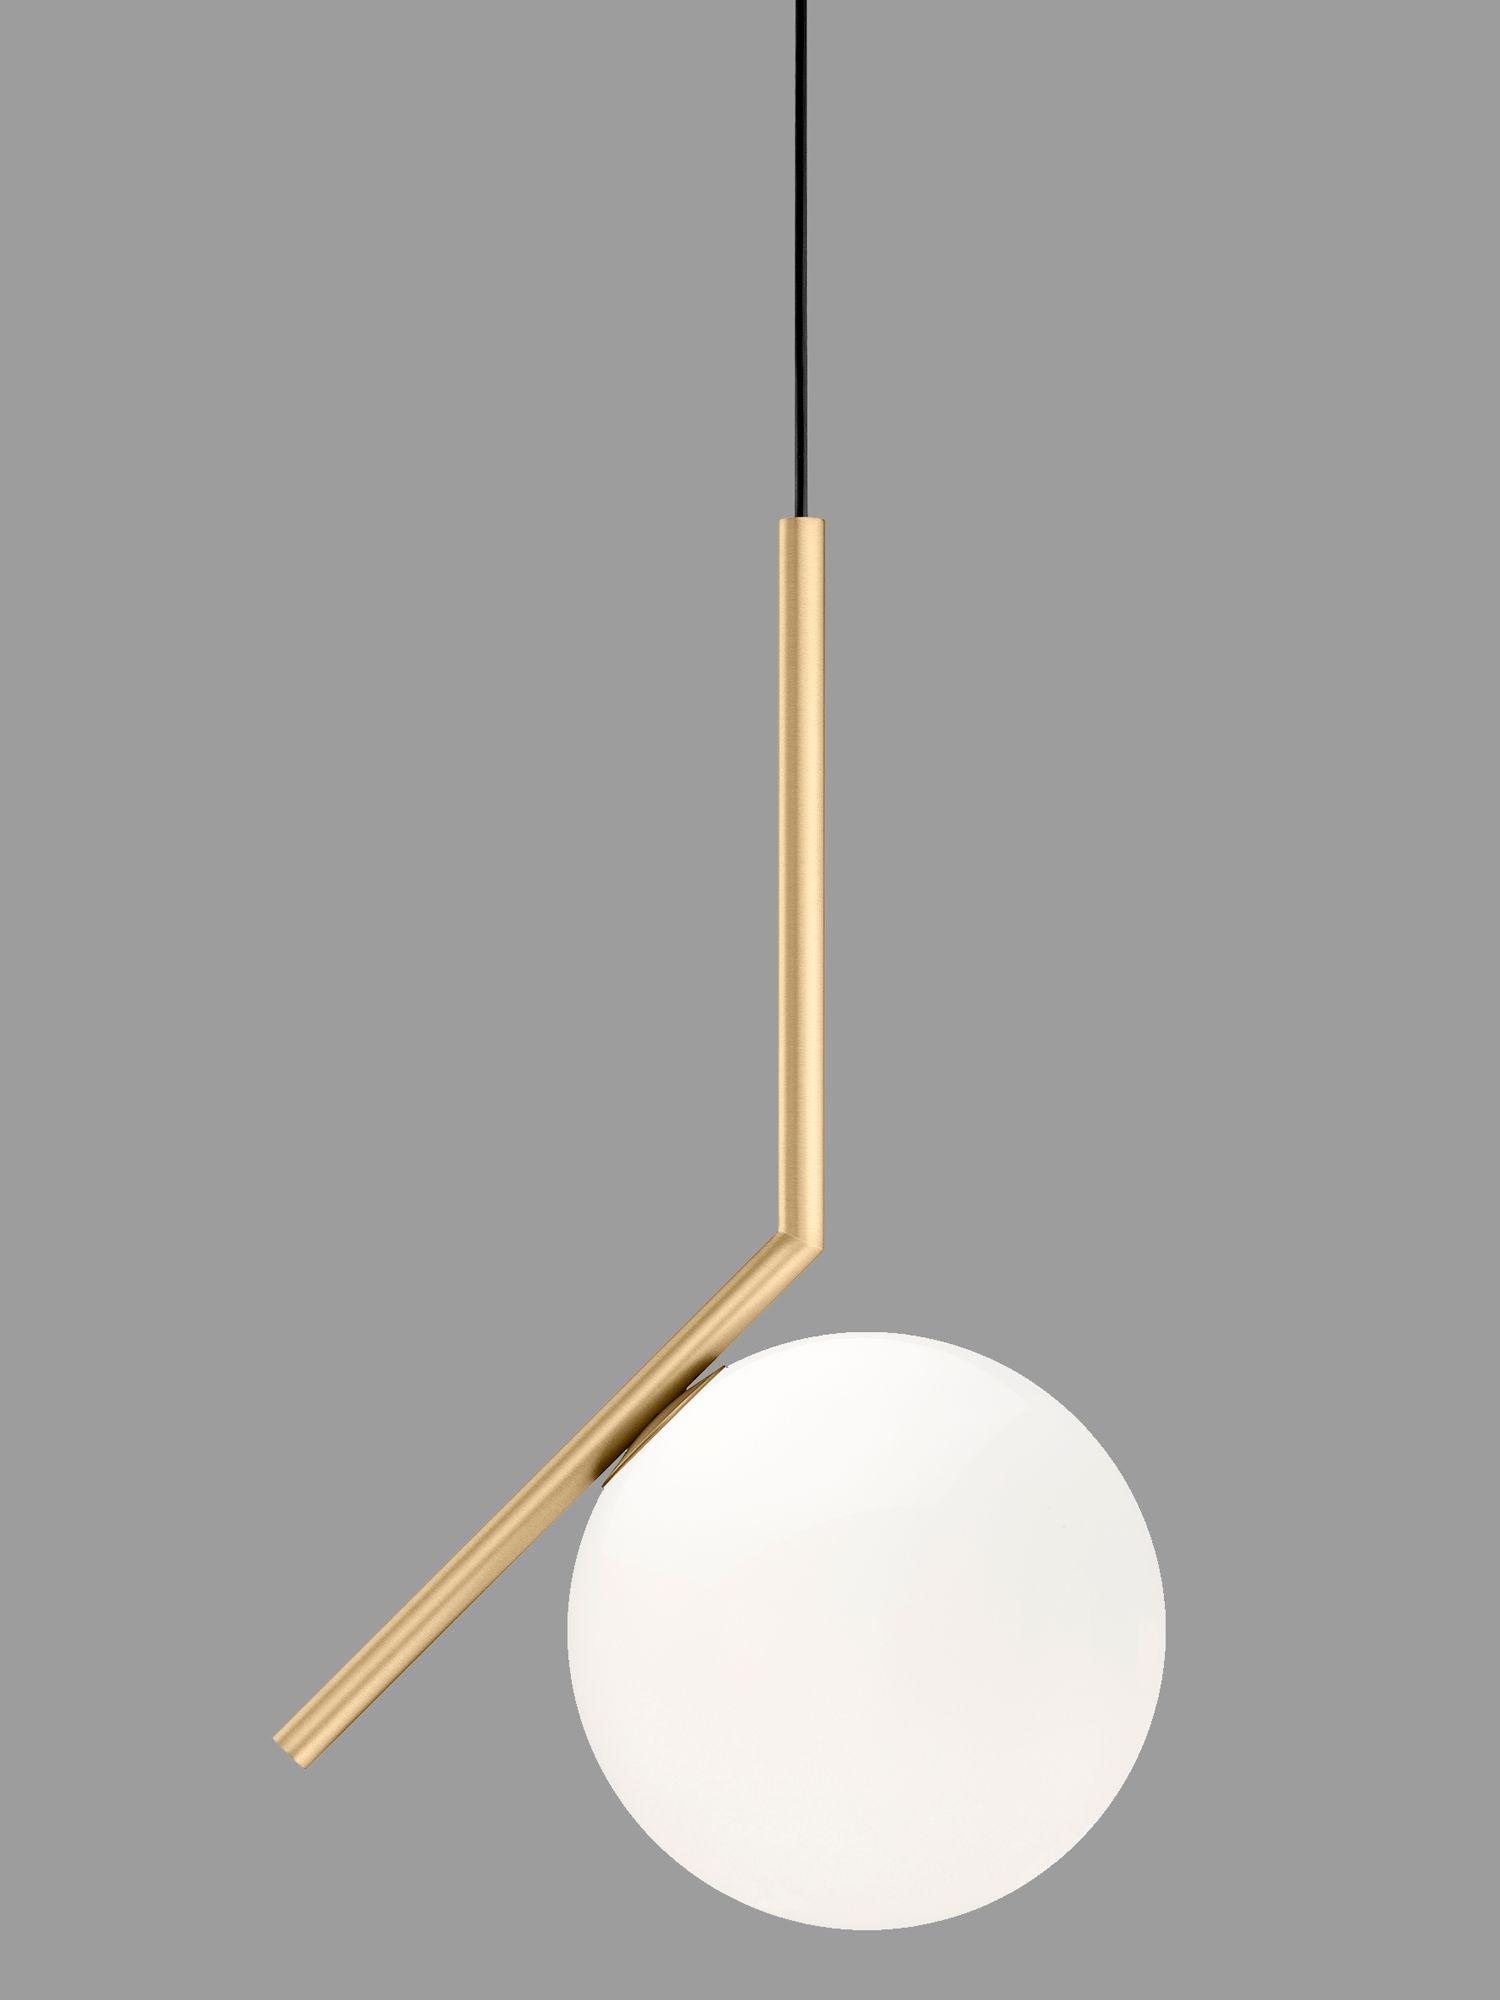 Flos Flos IC Lights 200 Pendant Light, Brushed Brass, Dia.20cm